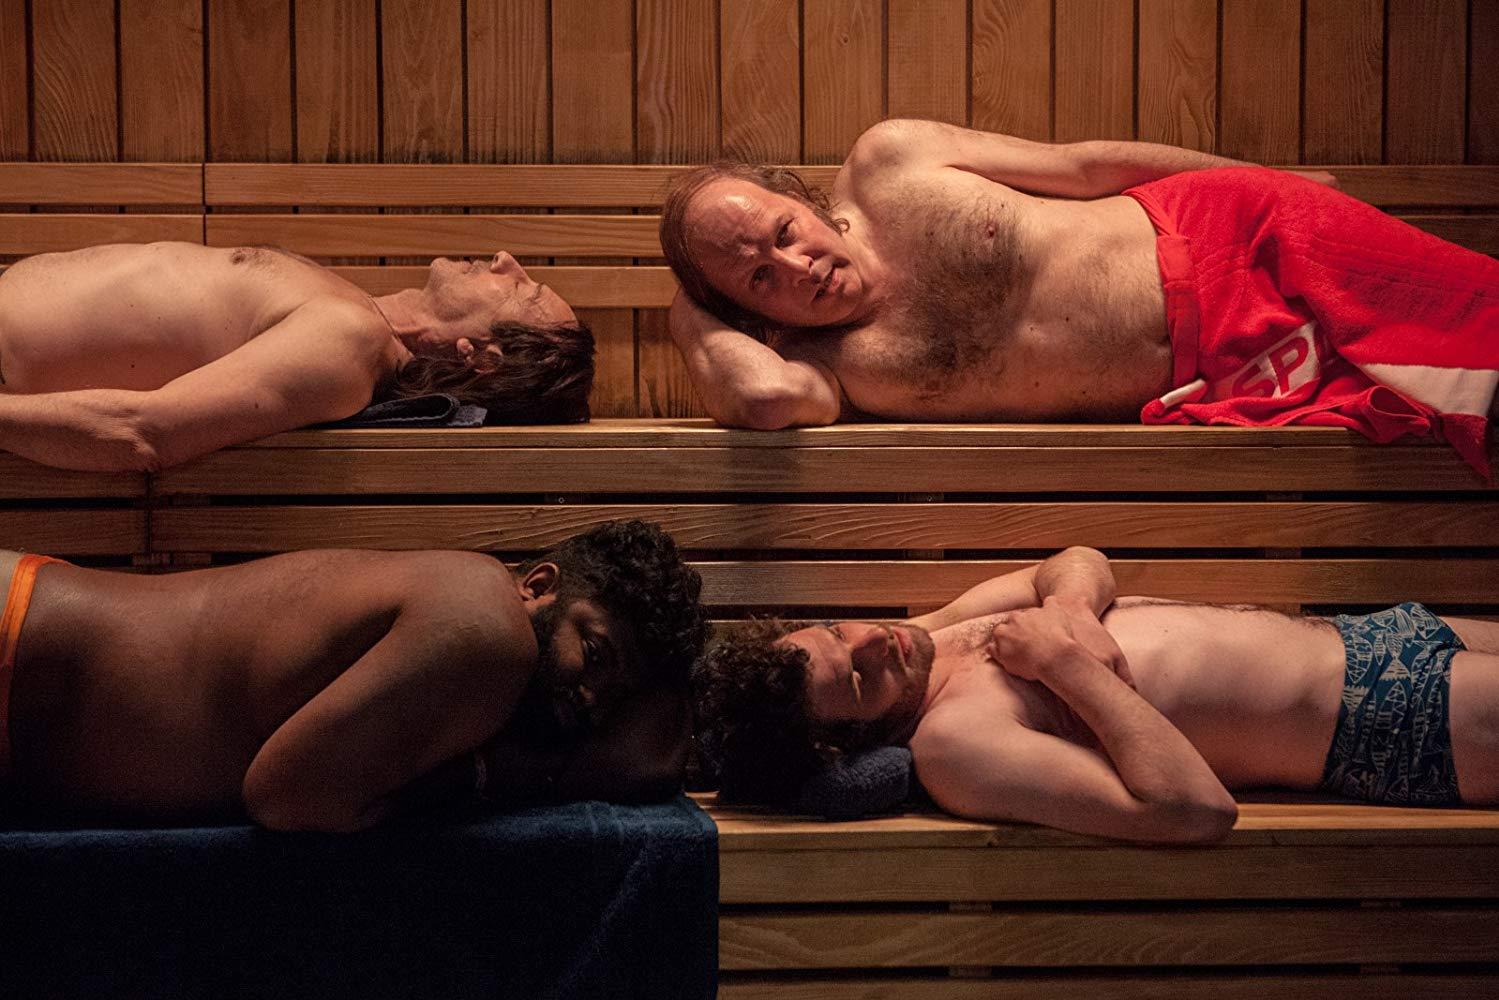 7 Uomini a mollo: Mathieu Amalric, Félix Moati, Philippe Katerine, Balasingham Thamilchelvan in una scena